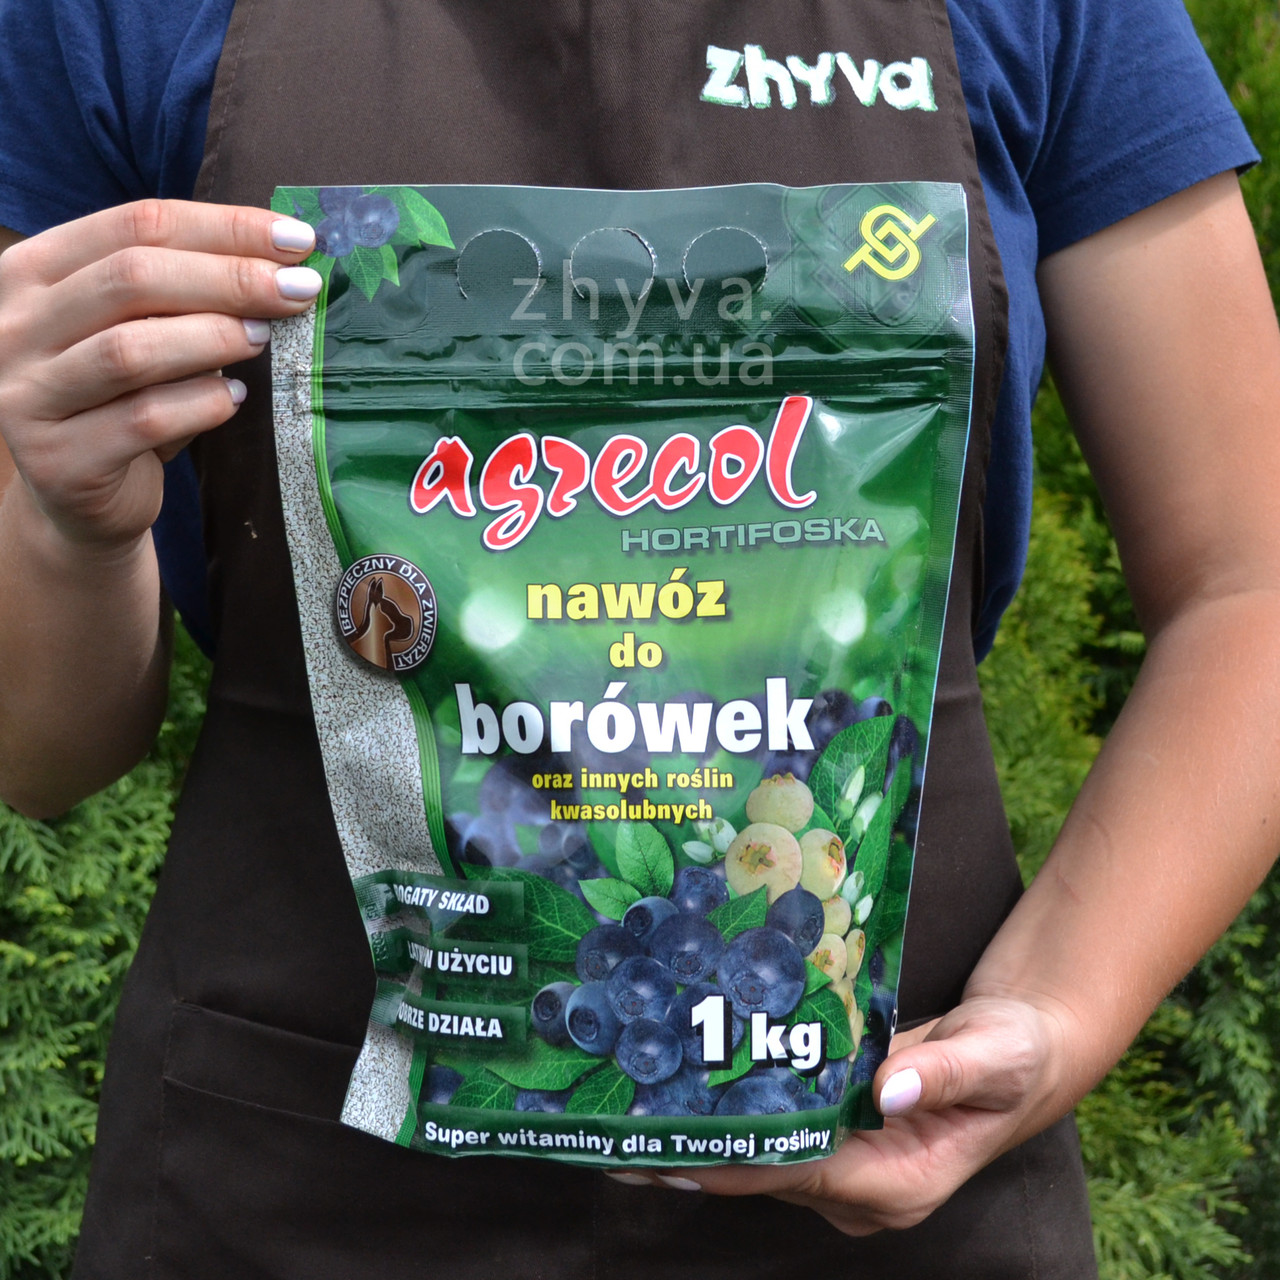 Добриво Argecol для чорниці, лохини Hortifoska 1кг